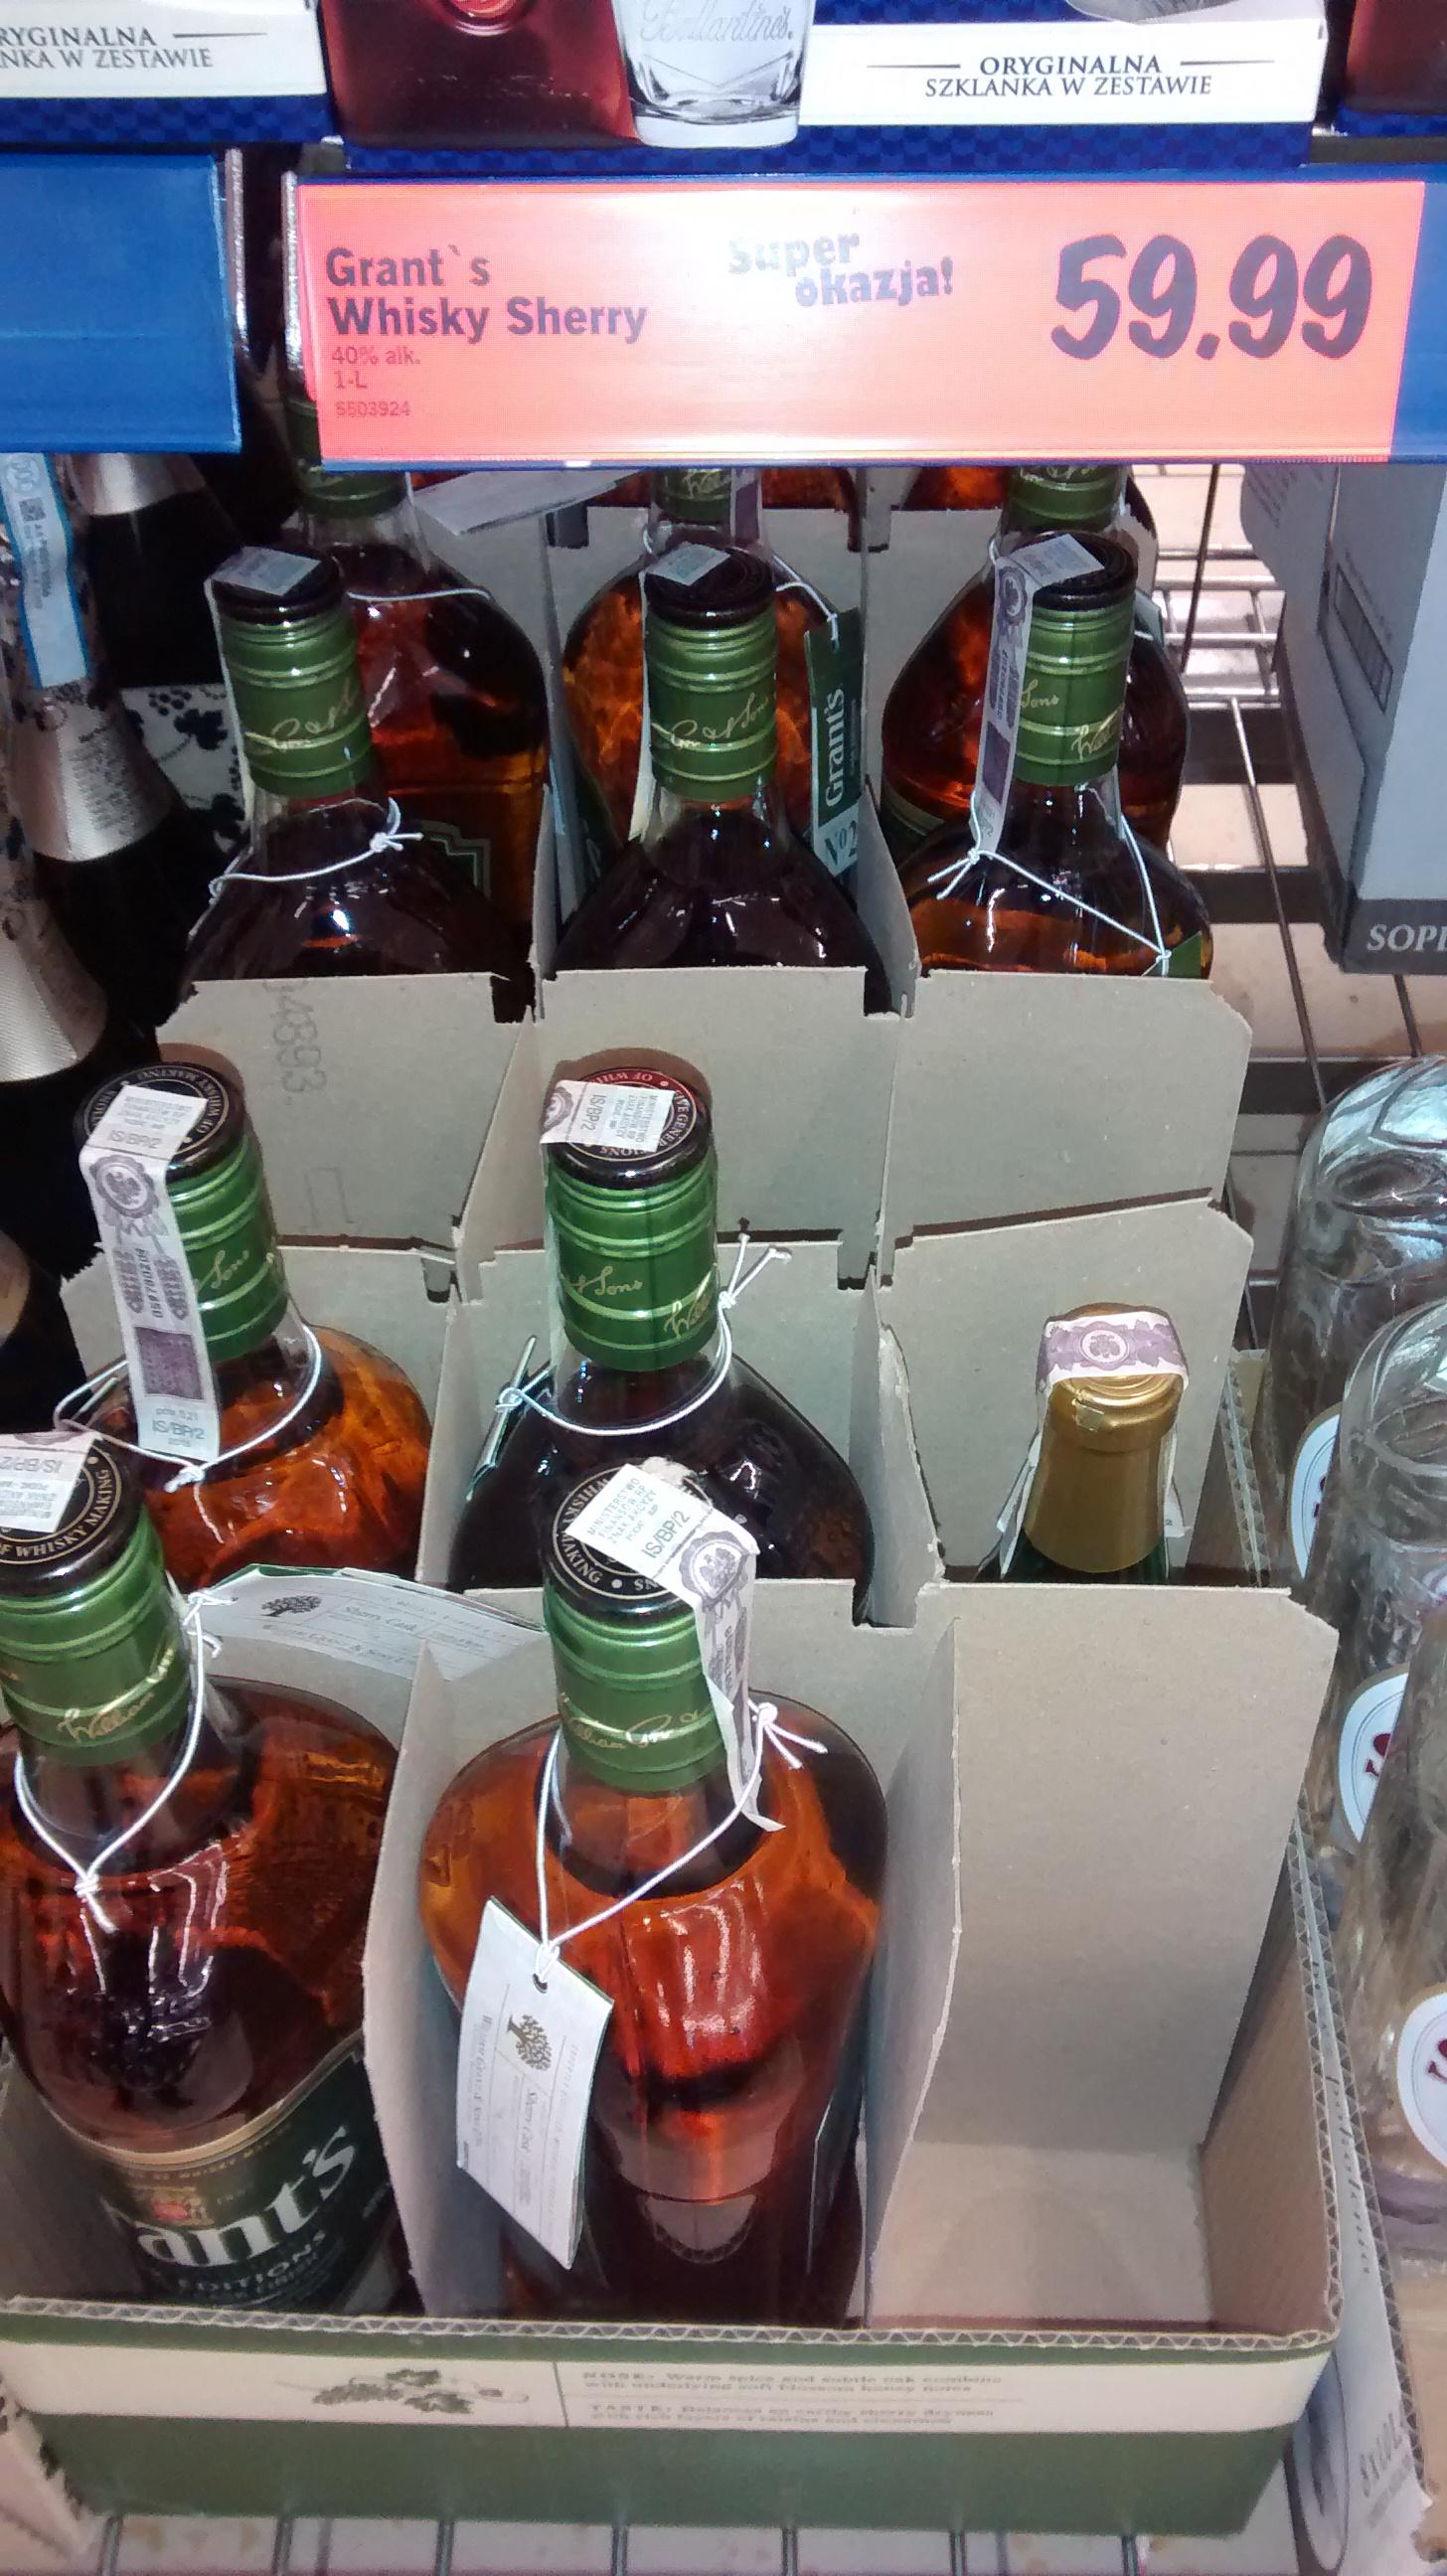 Grant's Sherry 1,L za 59.99  -  Lidl